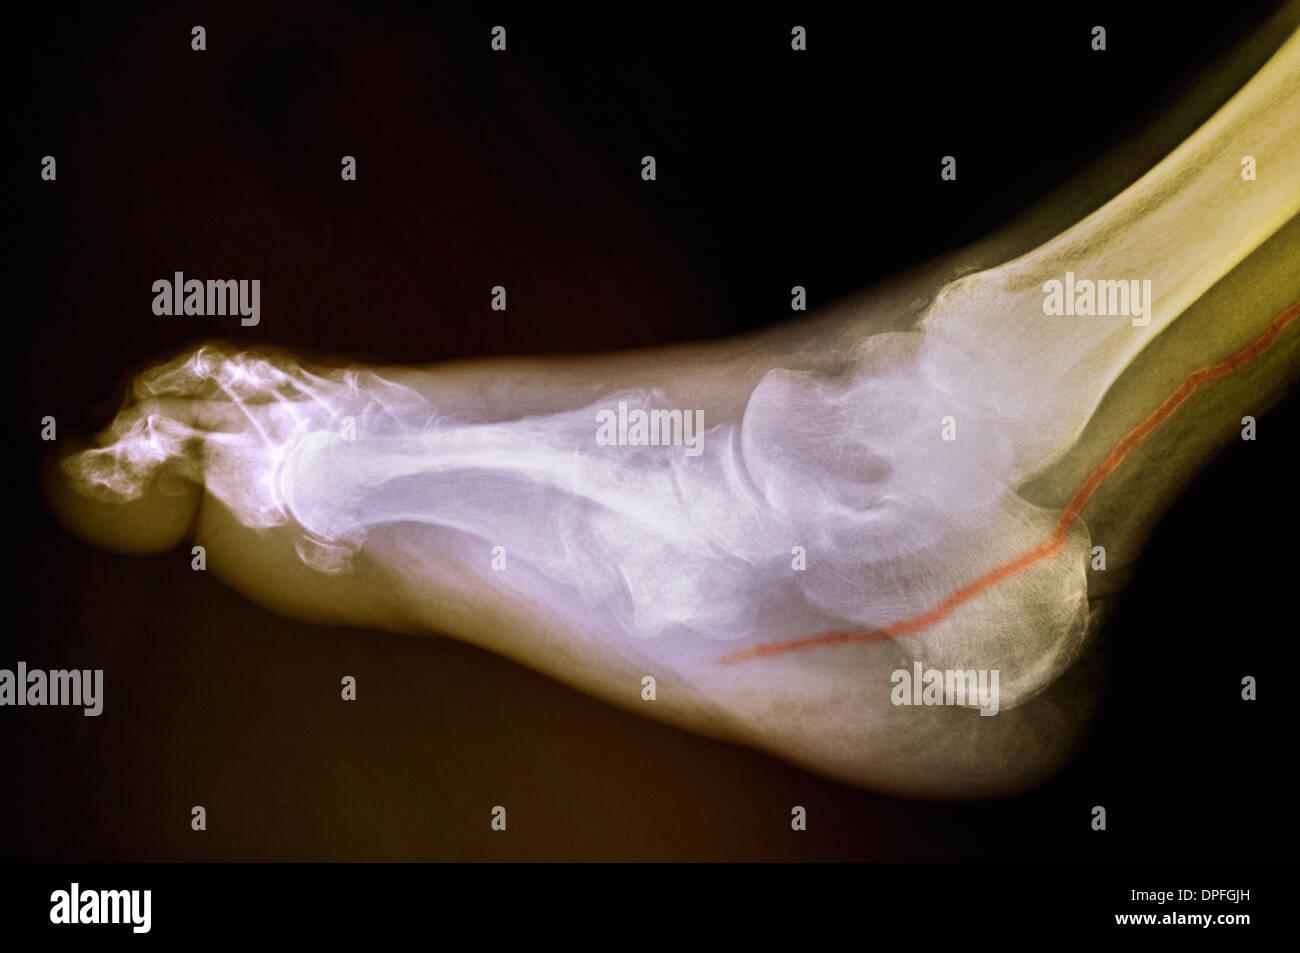 Diabetic Foot Stock Photos Amp Diabetic Foot Stock Images